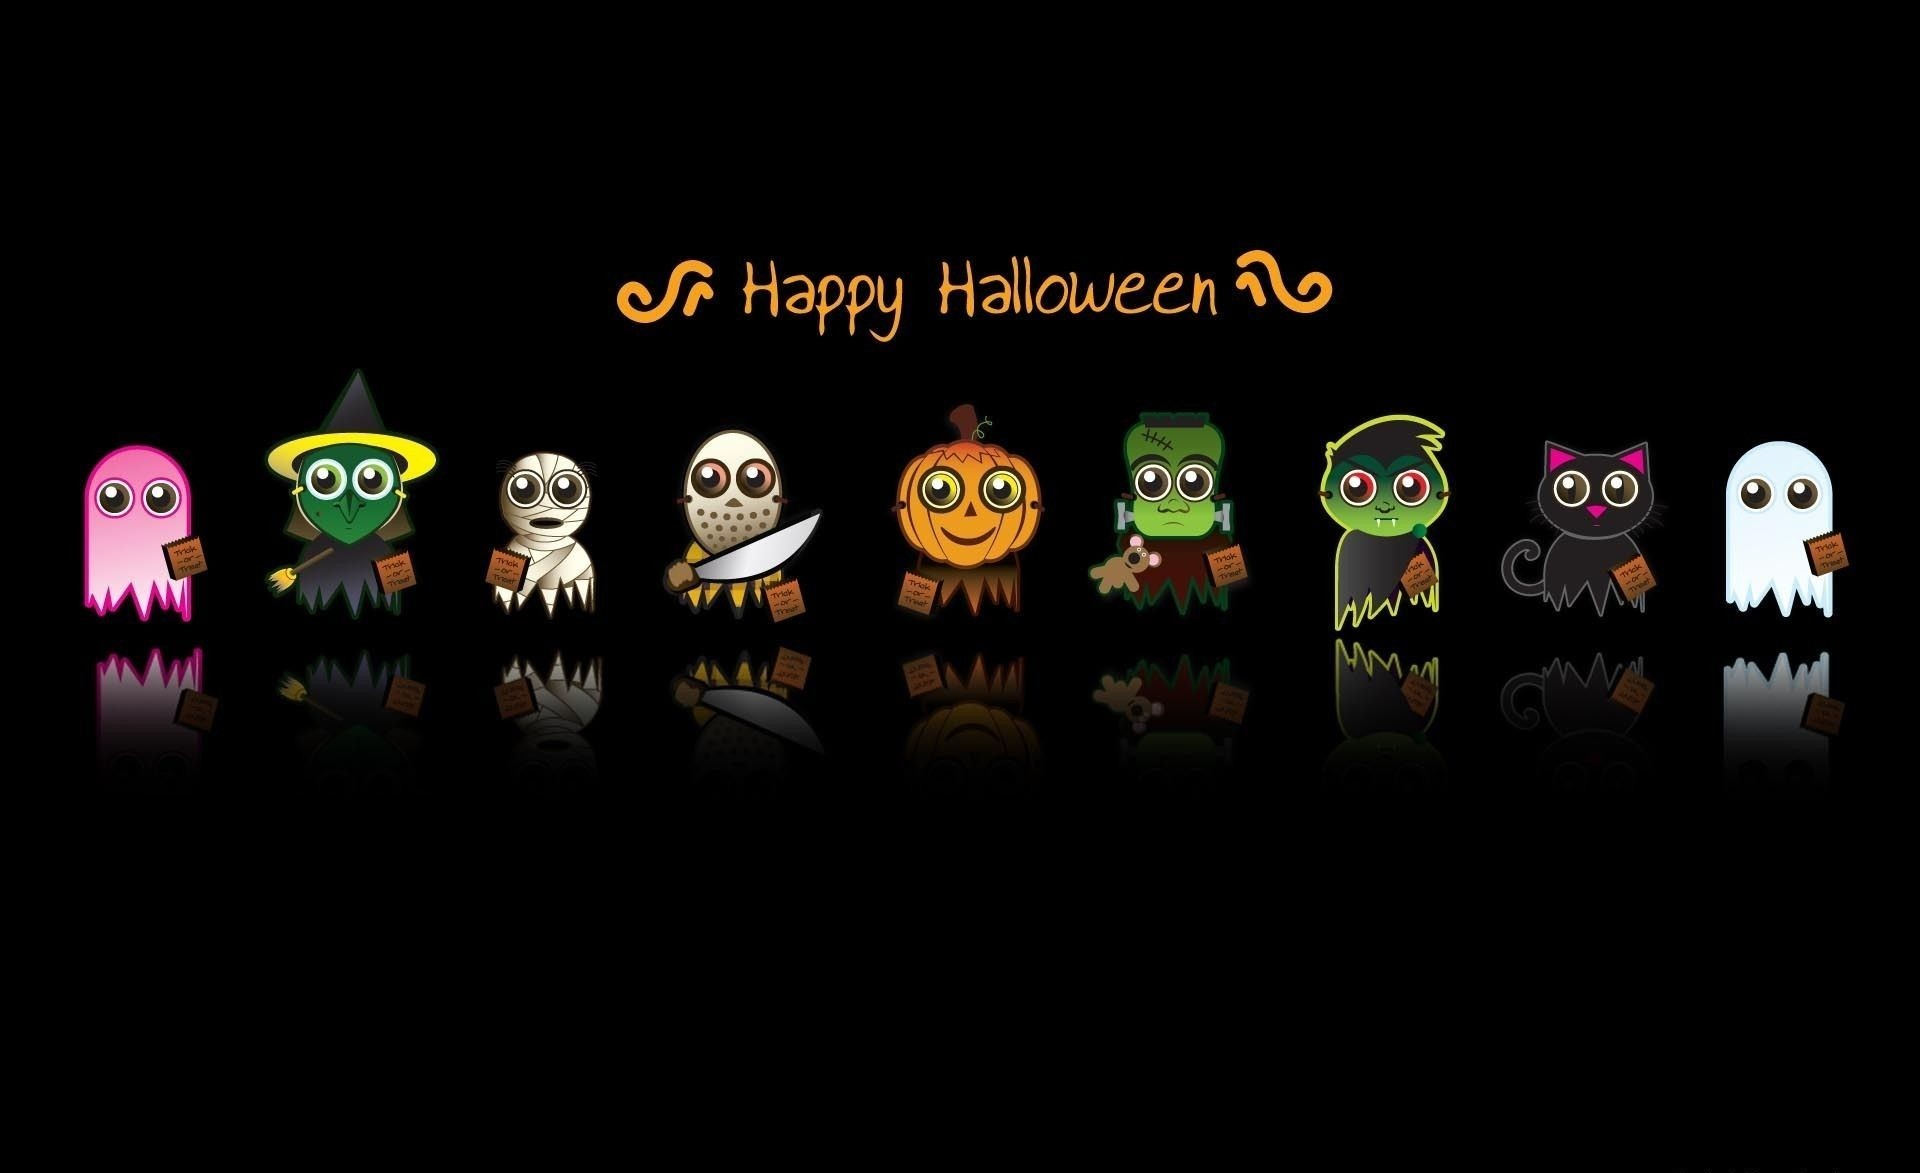 desktop backgrounds halloween theme cute halloween desktop backgrounds